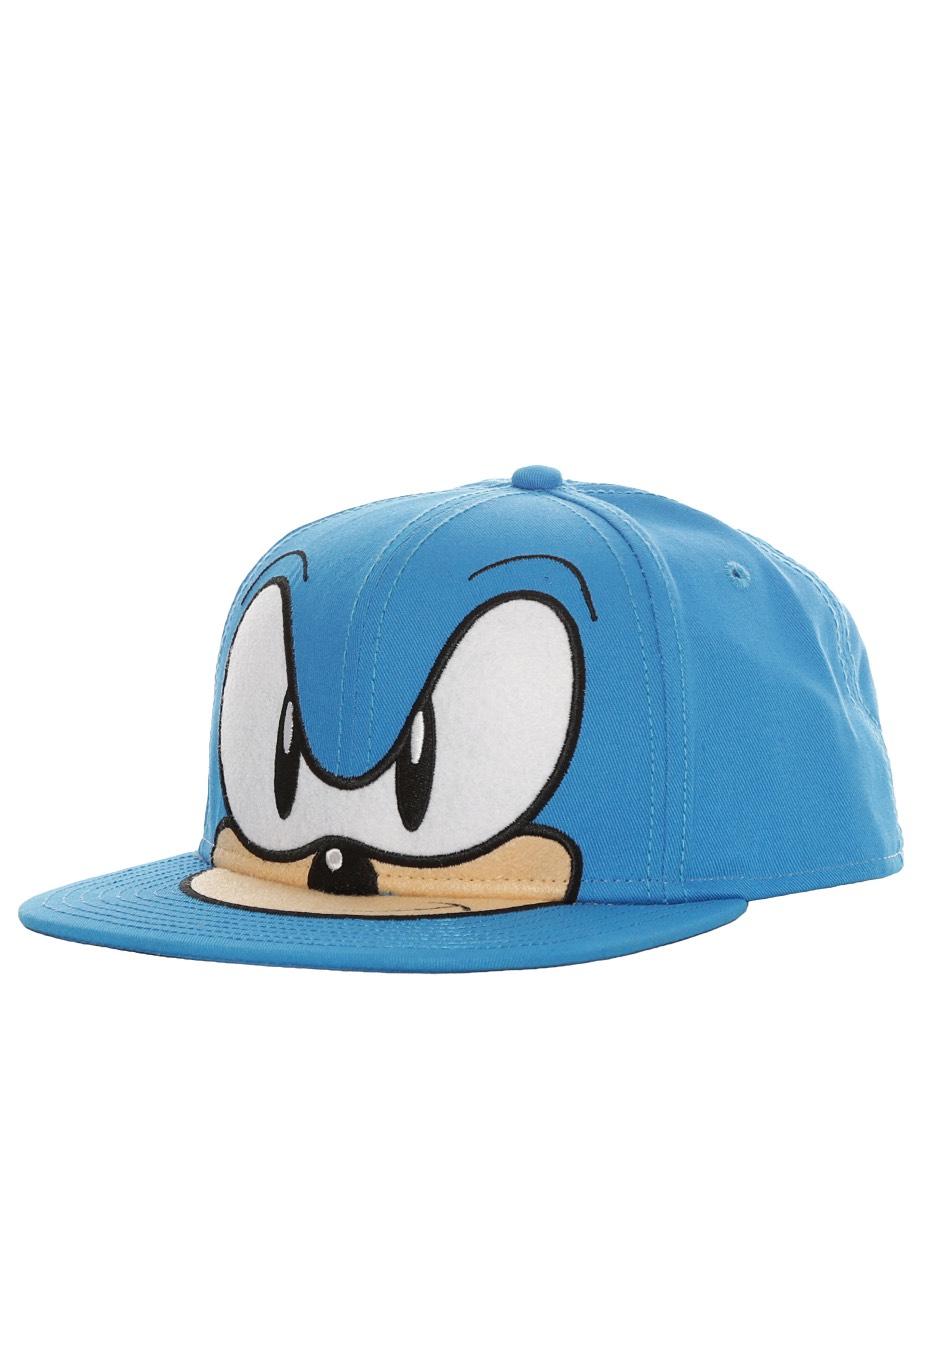 Sonic - Sonic The Hedgehog Blue - Cap - Impericon.com Worldwide b4b41fc35b10